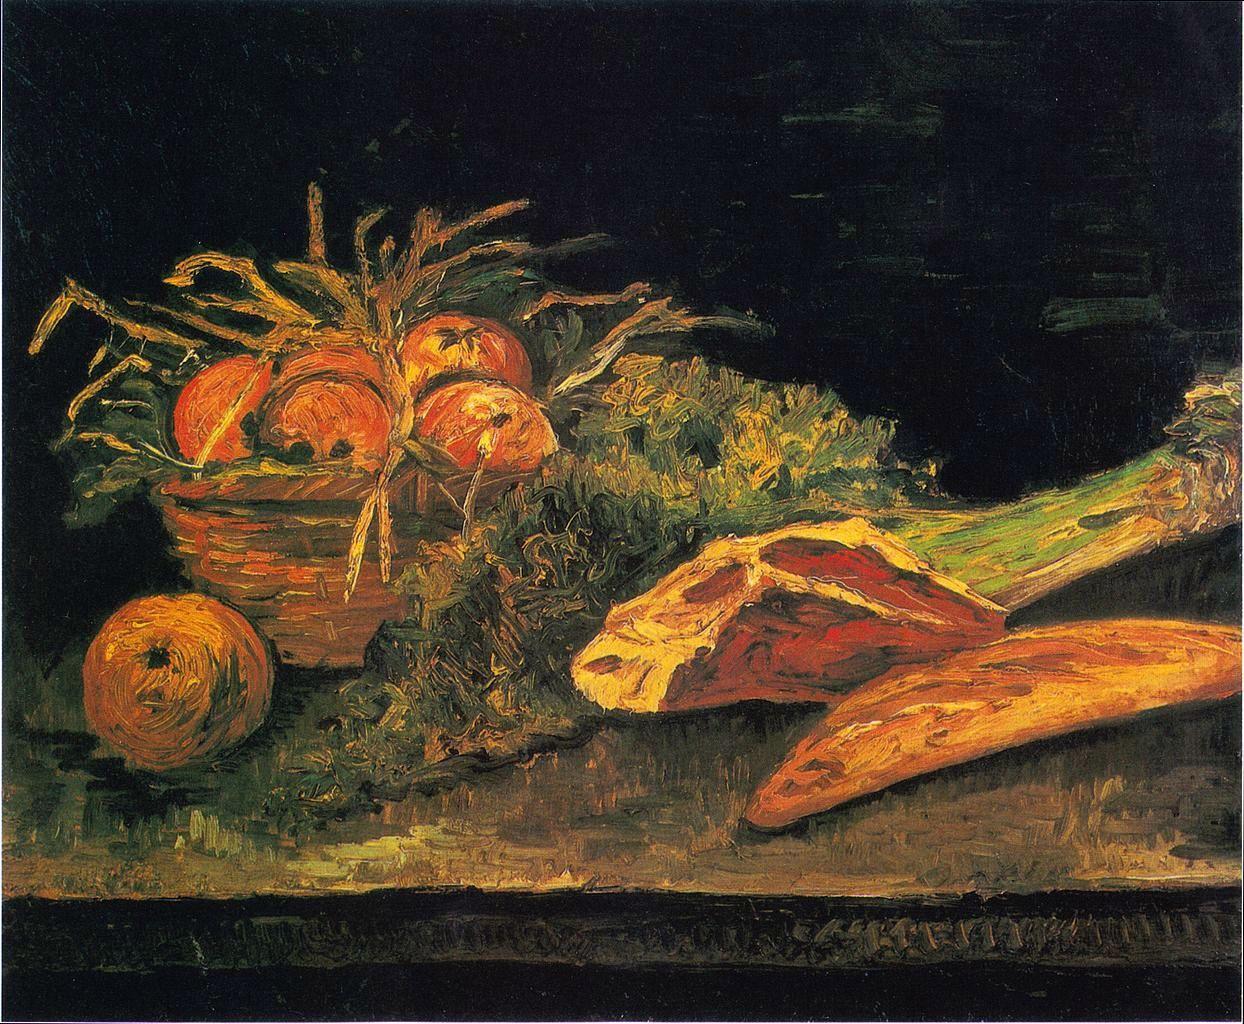 油画静物_有苹果篮、肉和面包卷的静物画_Still Life with Apple Basket, Meat and Bread Rolls-文森特·梵高